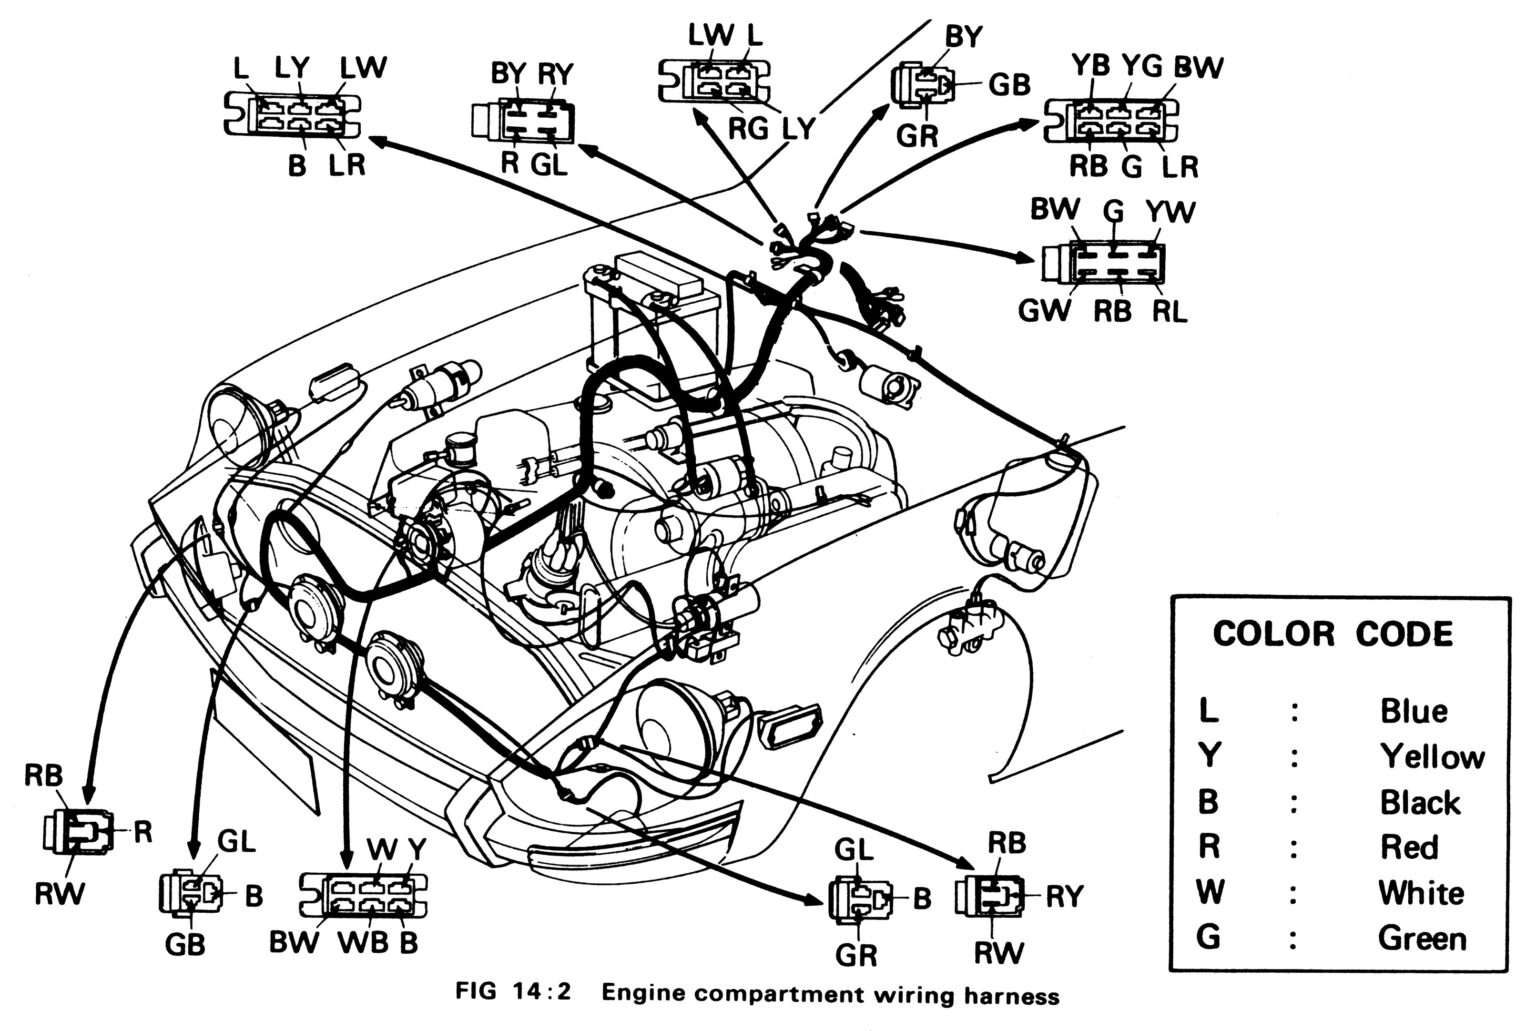 Z Specialties Parts Diagrams 1970-78 240Z, 260Z & 280Z